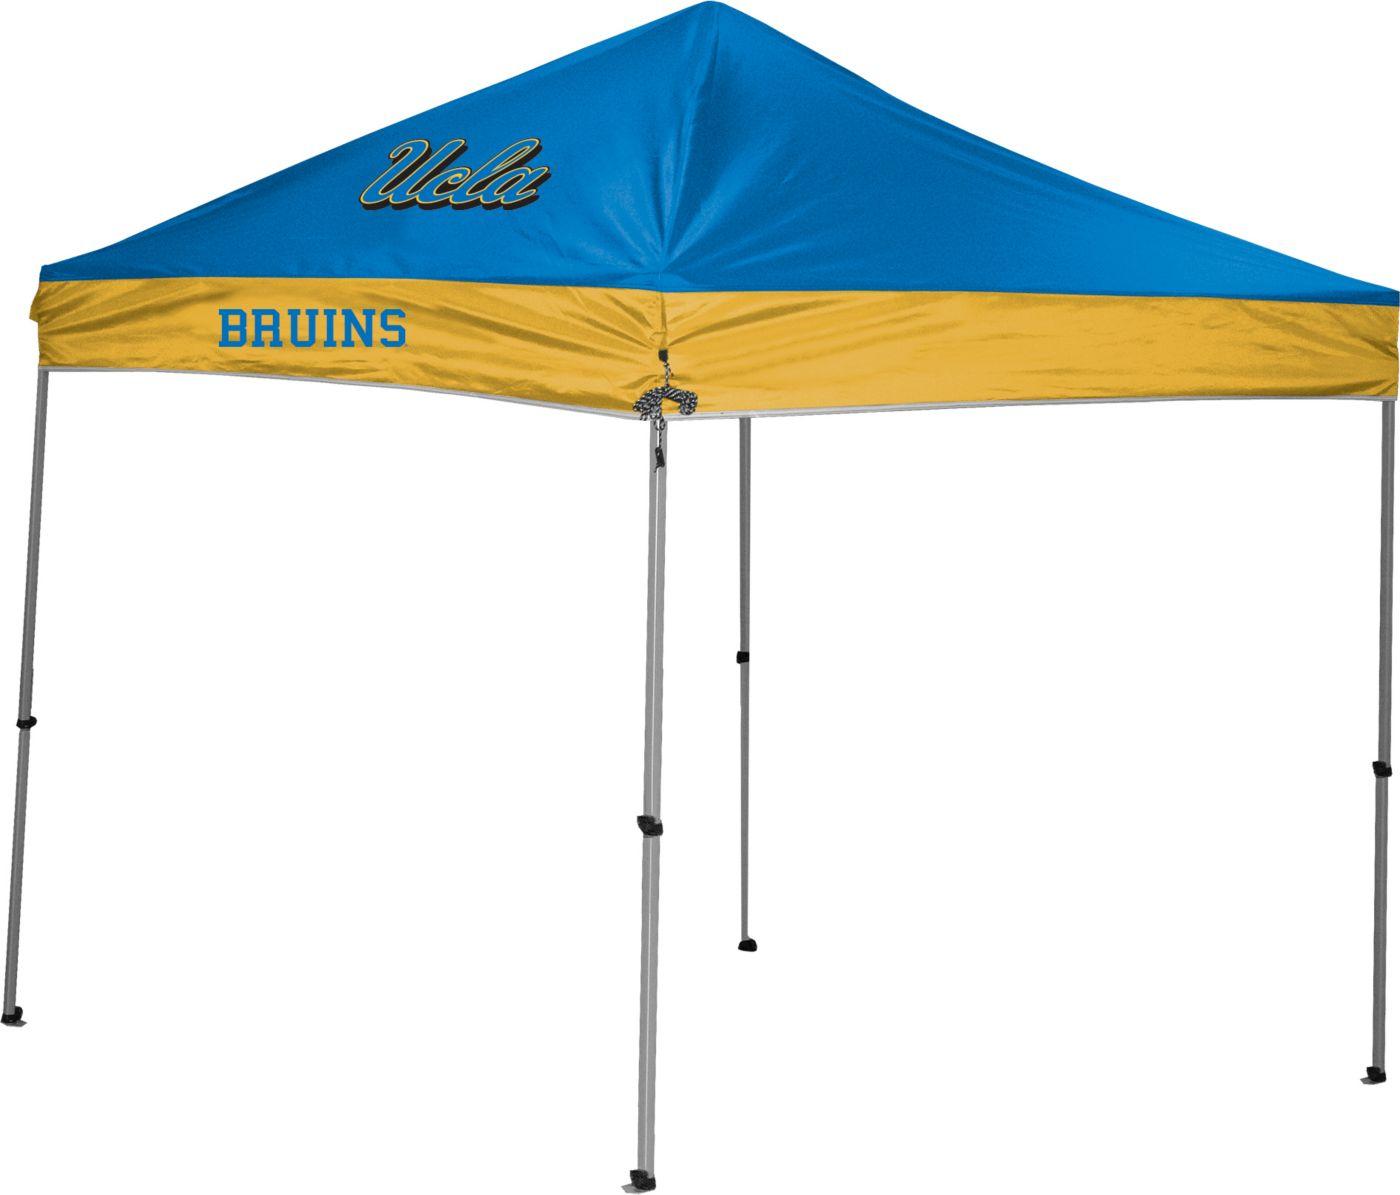 Rawlings UCLA Bruins 9' x 9' Sideline Canopy Tent